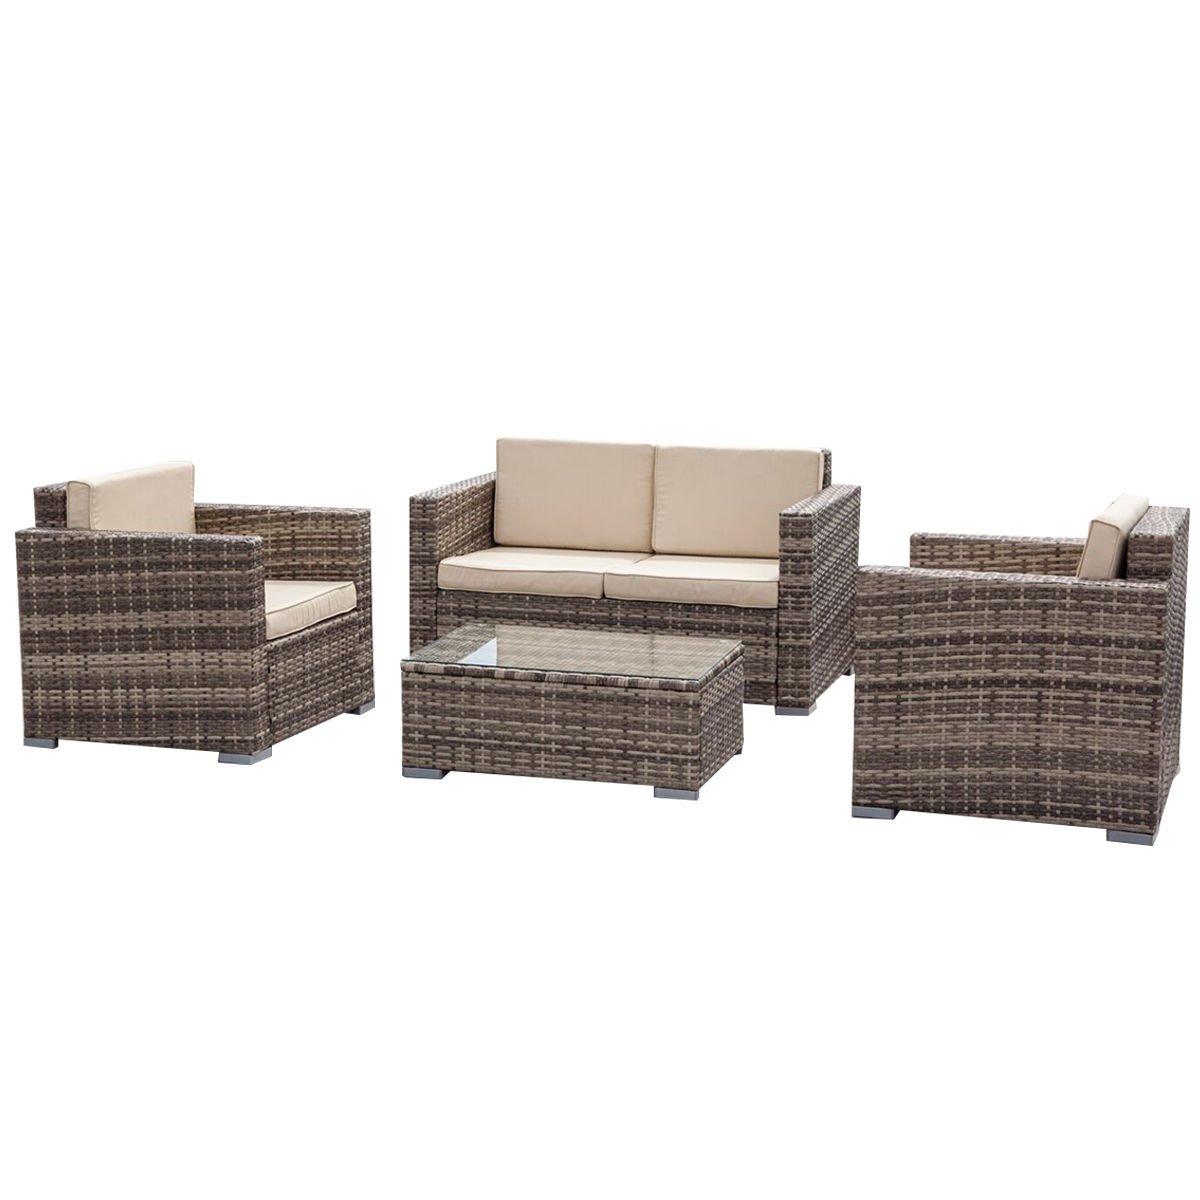 Galvanized Patio Furniture.Amazon Com Furniture Set 4pc Outdoor Patio Rattan Sectional